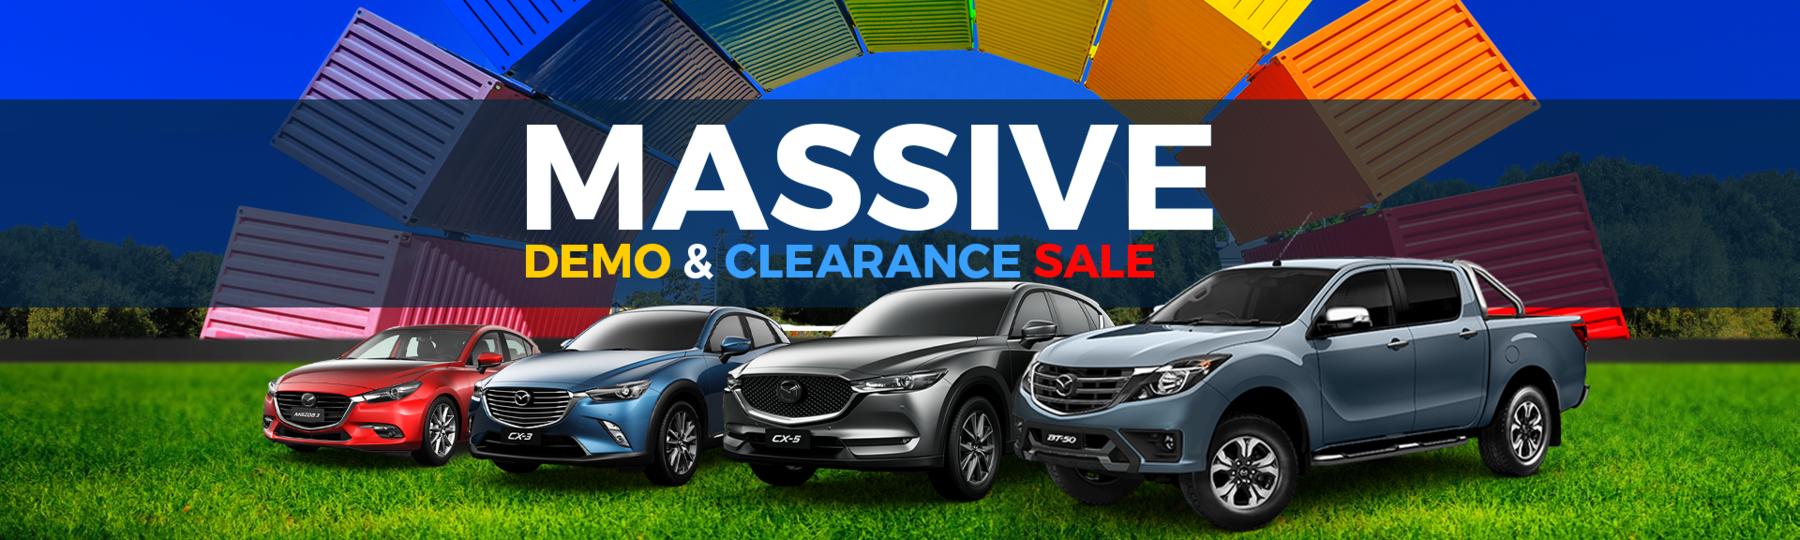 Mazda Clearance Sale